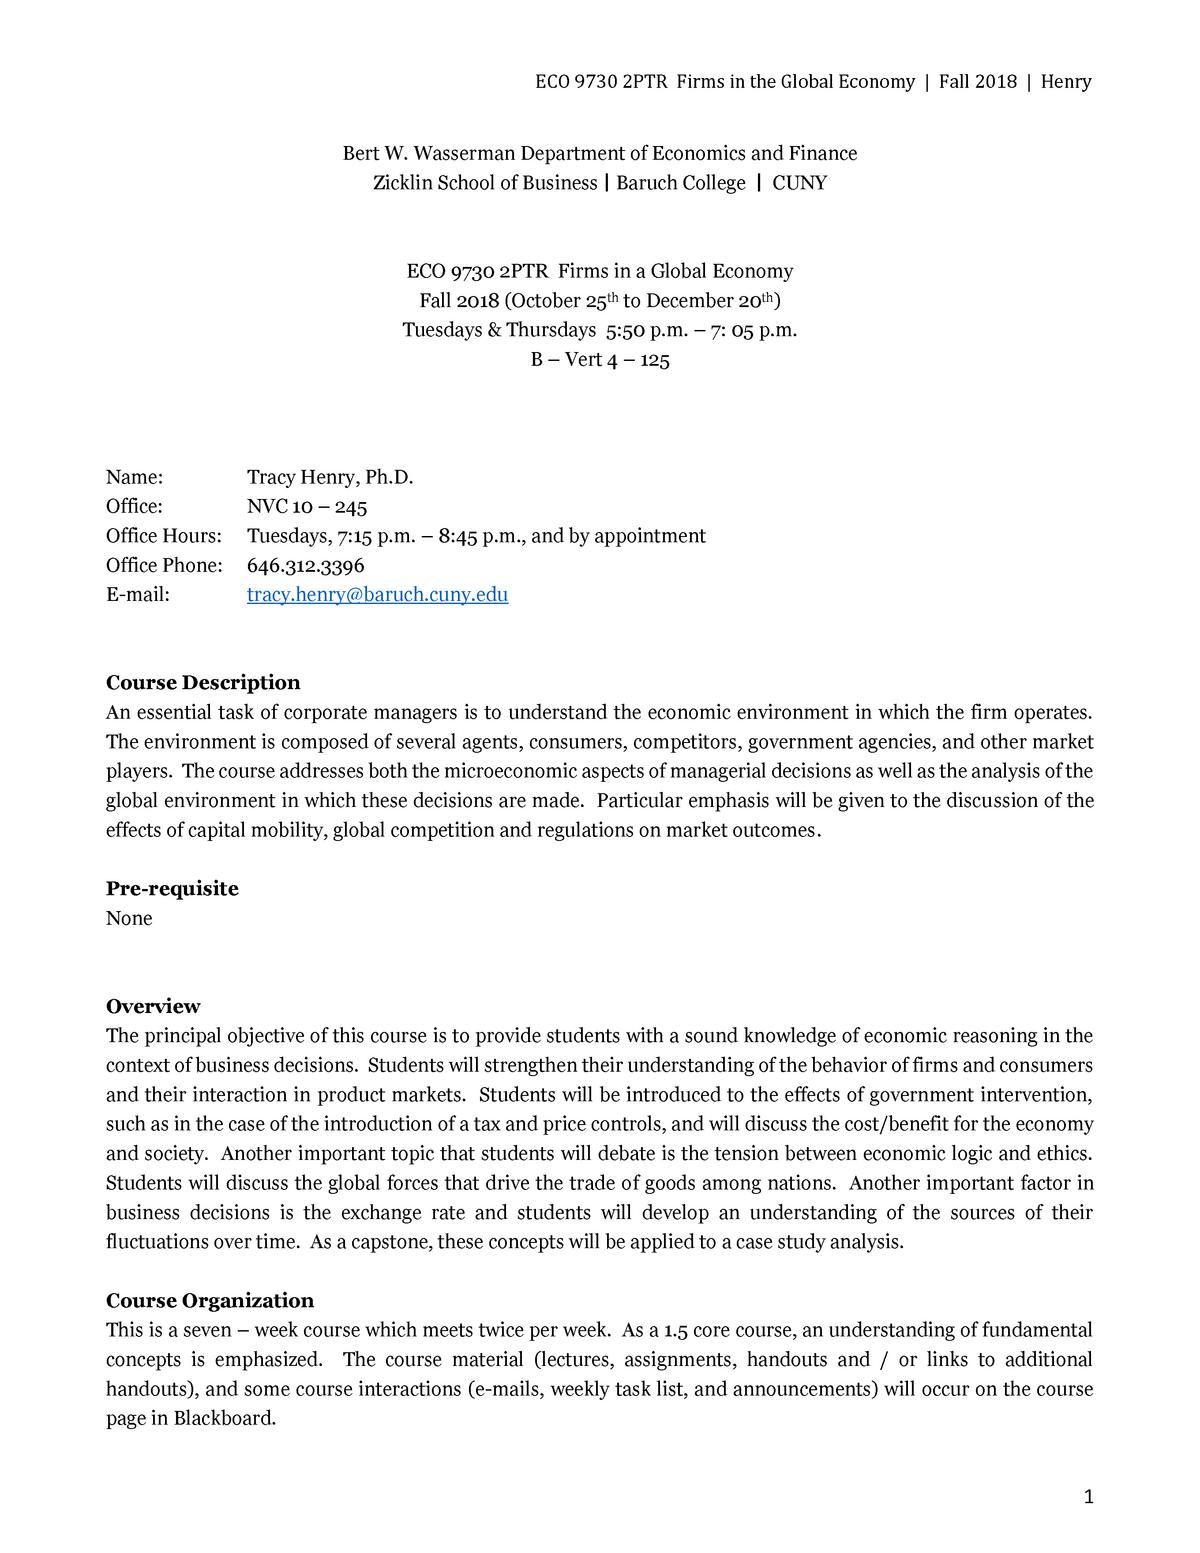 Course syllabus - ECO 9740: Fundamentals Of Macroeconomics - StuDocu